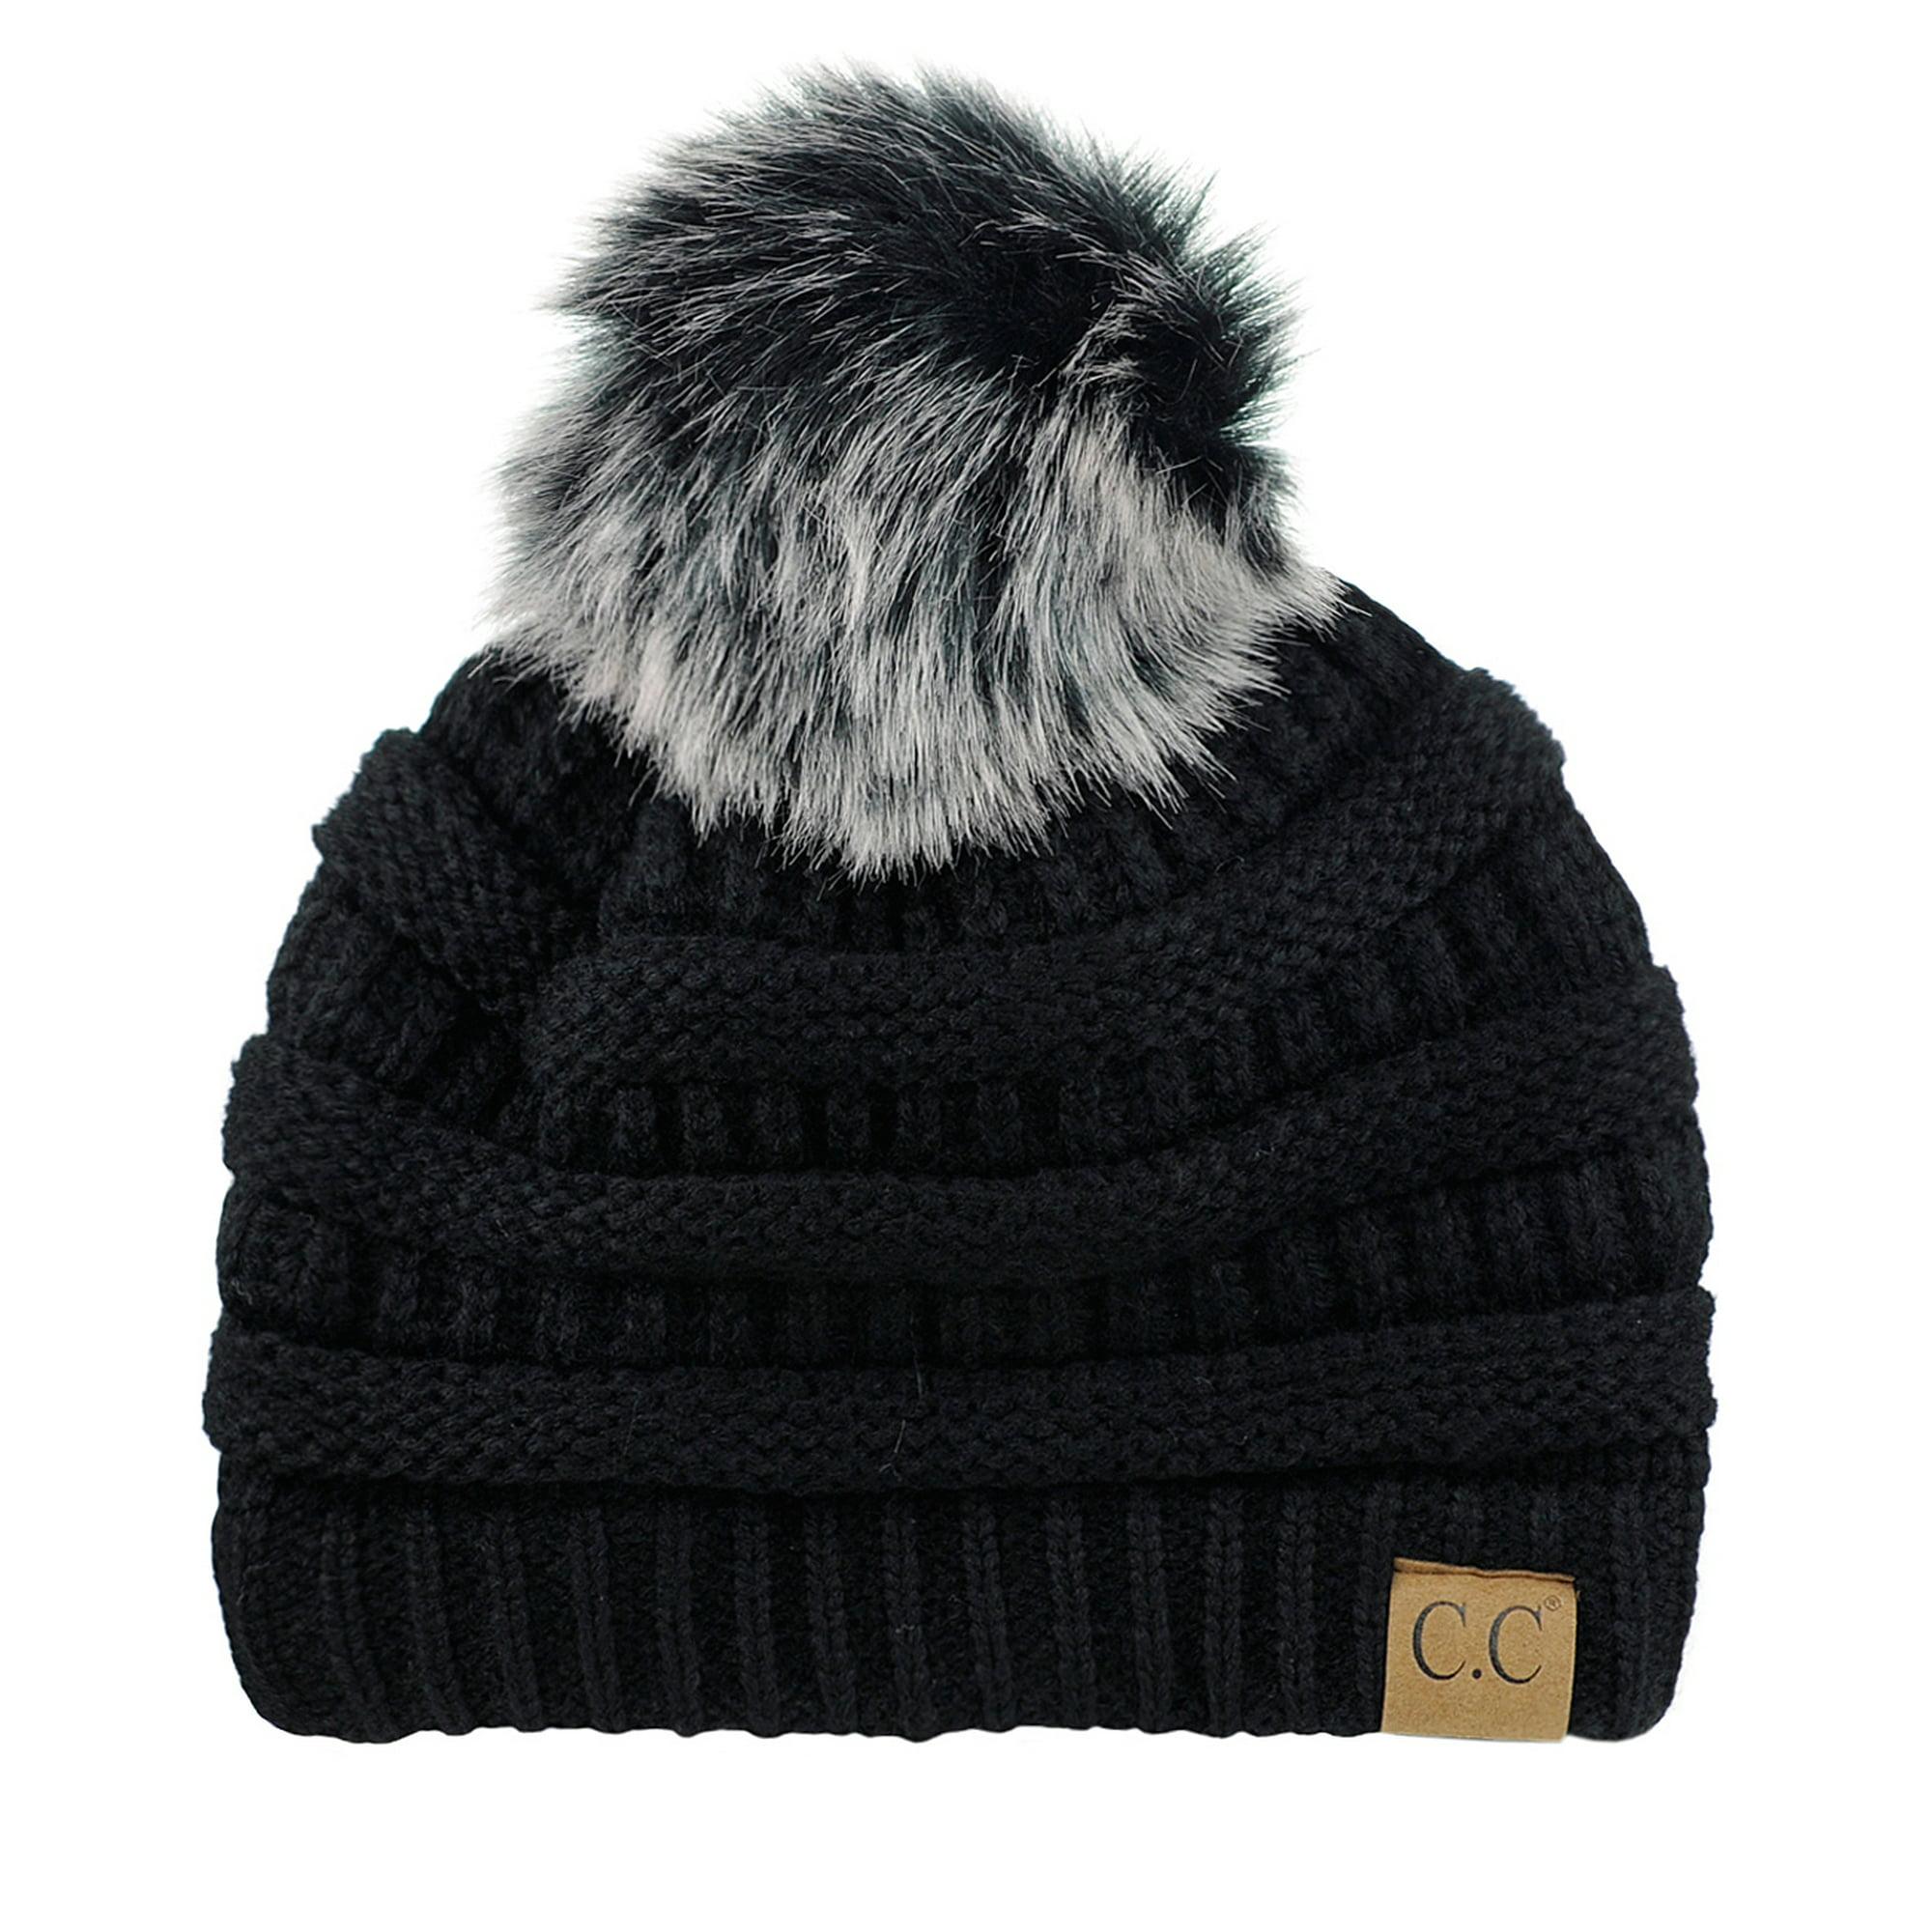 ef80b0431c6a8 NYFASHION101 Exclusive Soft Stretch Cable Knit Faux Fur Pom Pom Beanie Hat  - Melange Gray Metallic